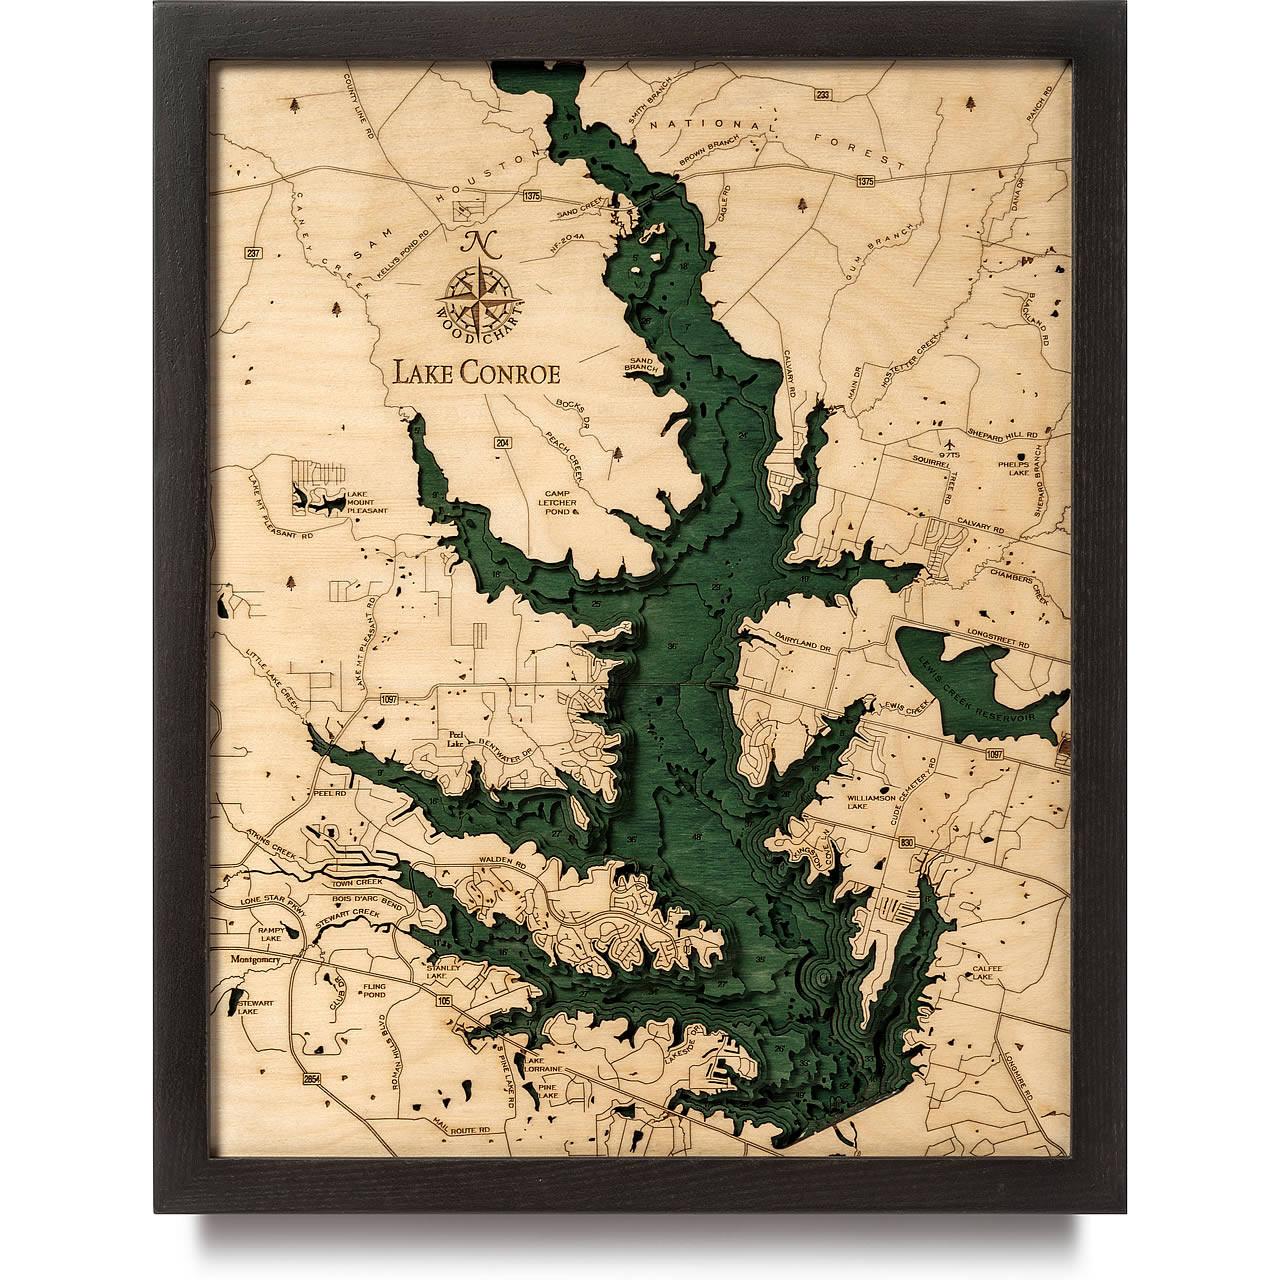 3d Map Of Texas.Lake Conroe